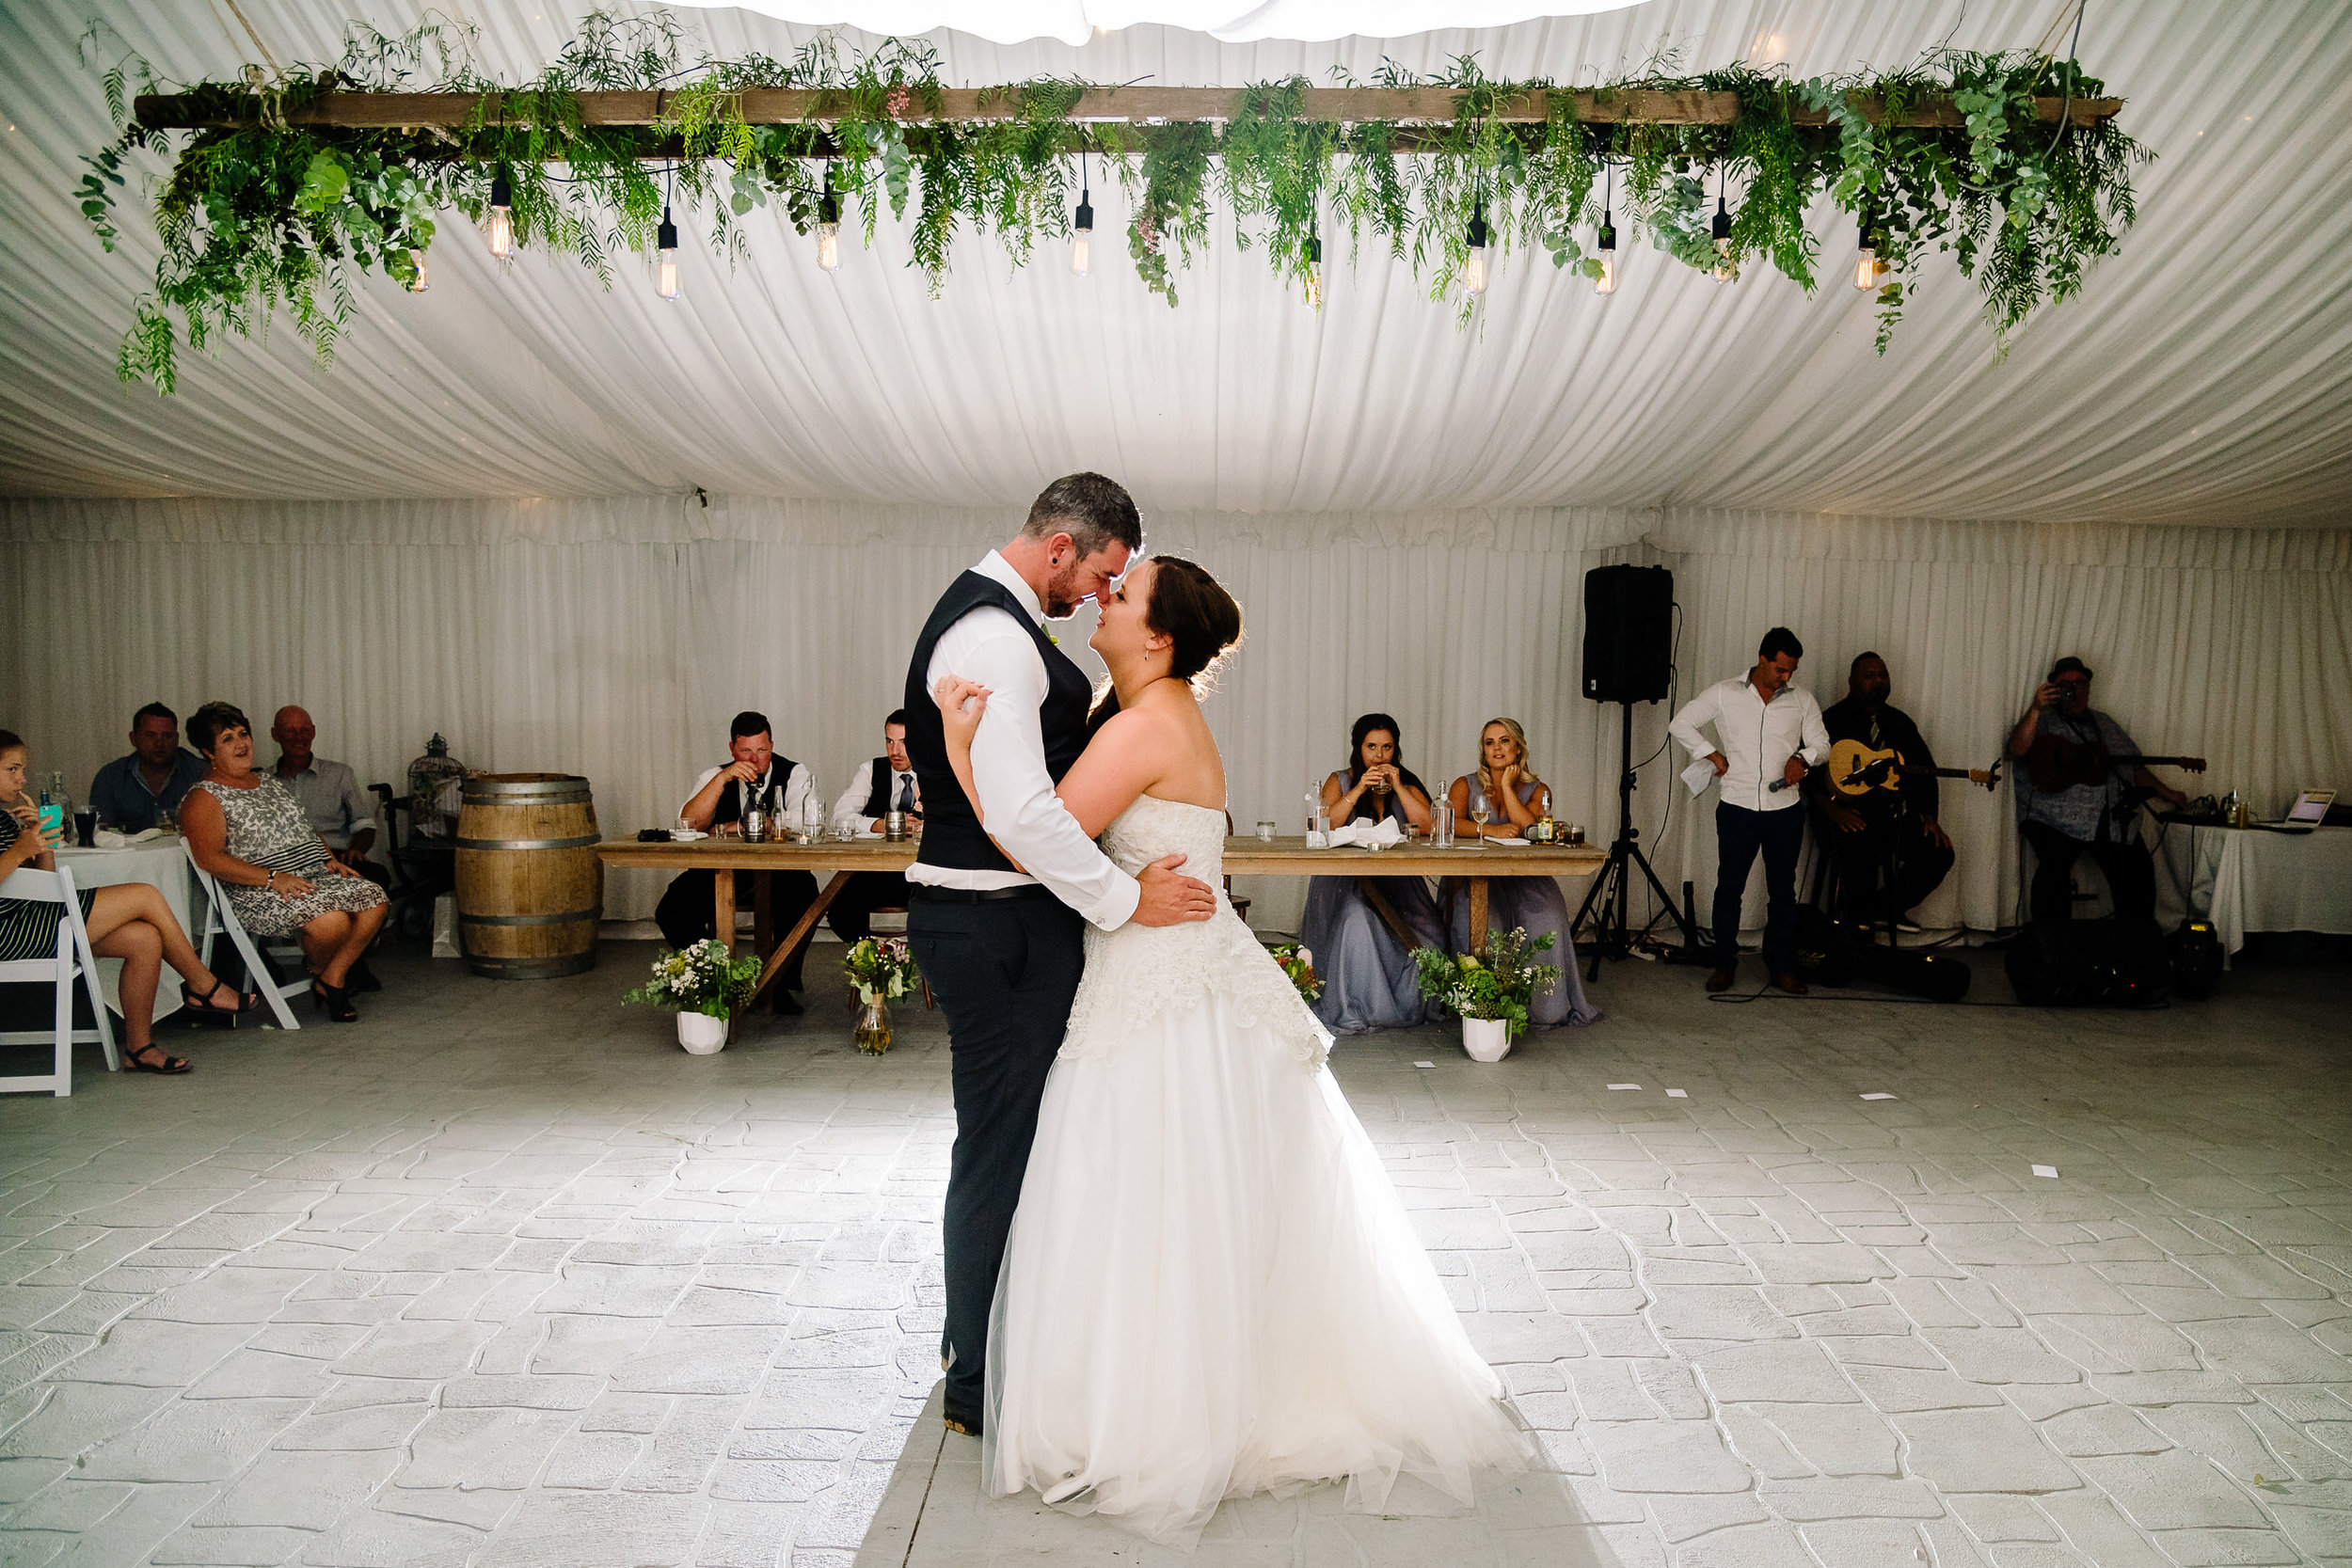 Justin_Jim_Echuca_Wedding_Photography_Tindarra-315.JPG